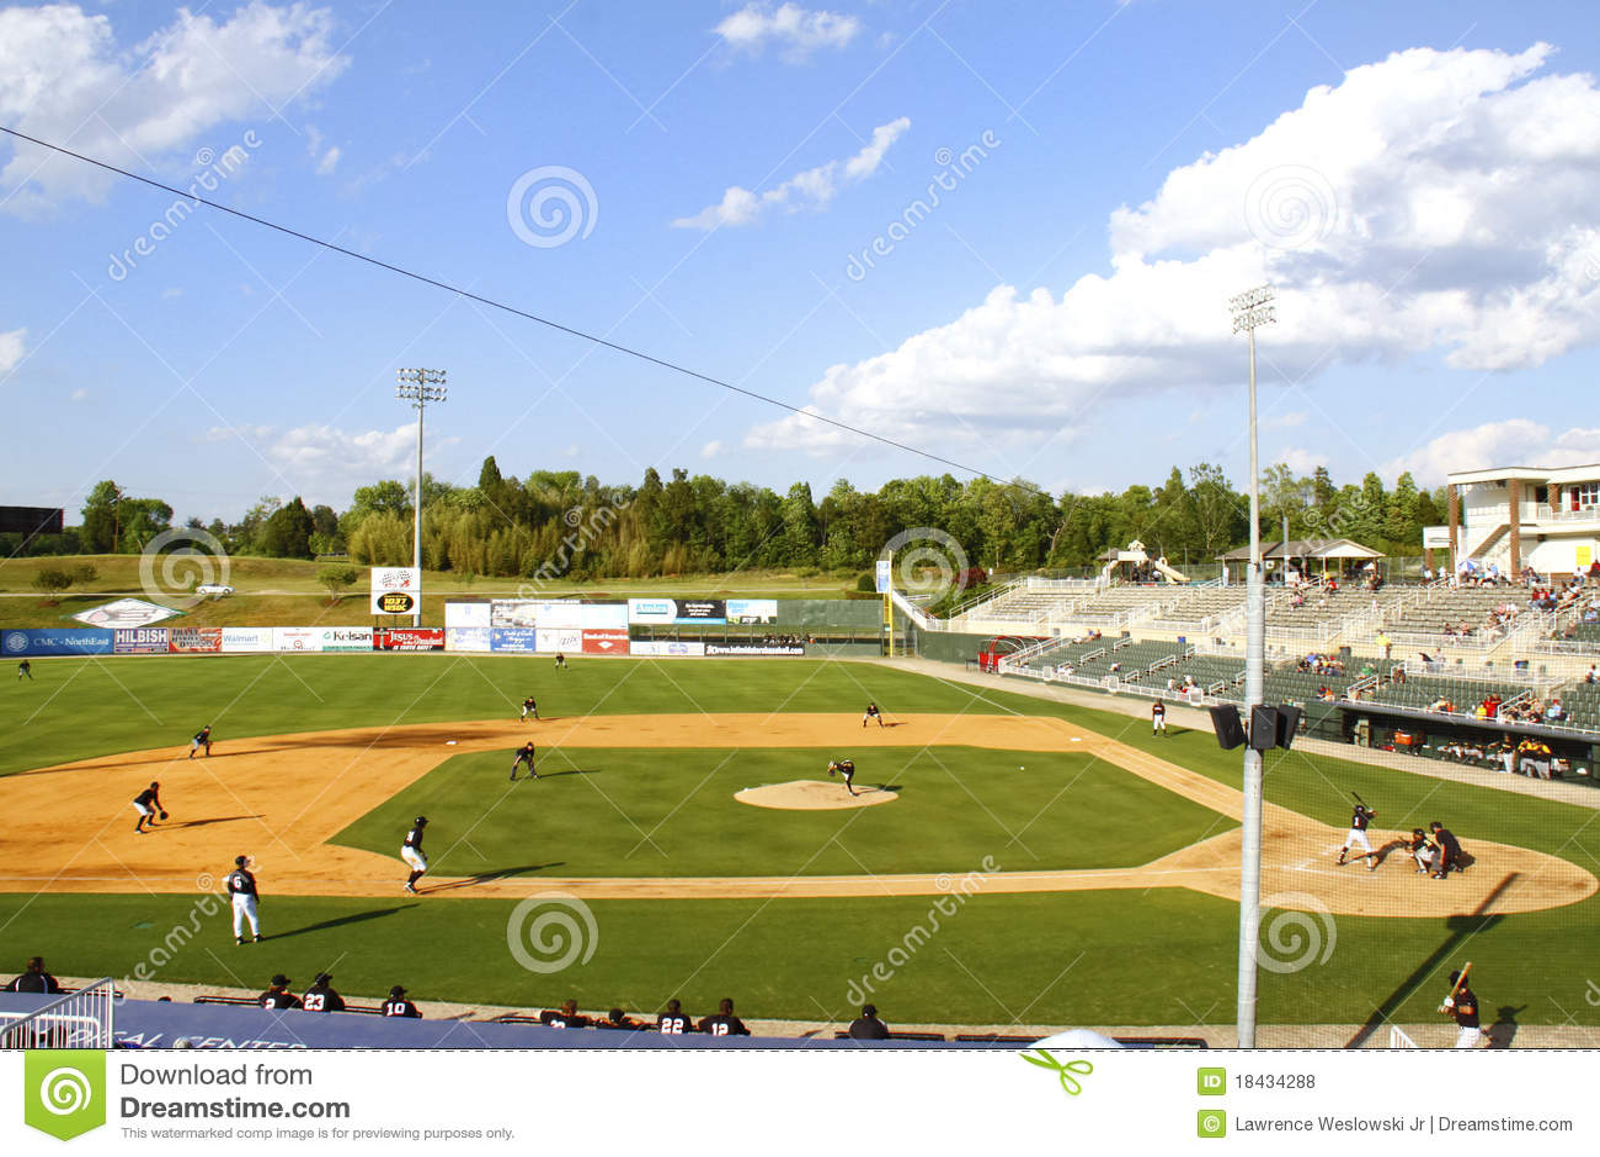 Baseball Stadium Crowd Clipart Day-time-minor-league-baseball ...